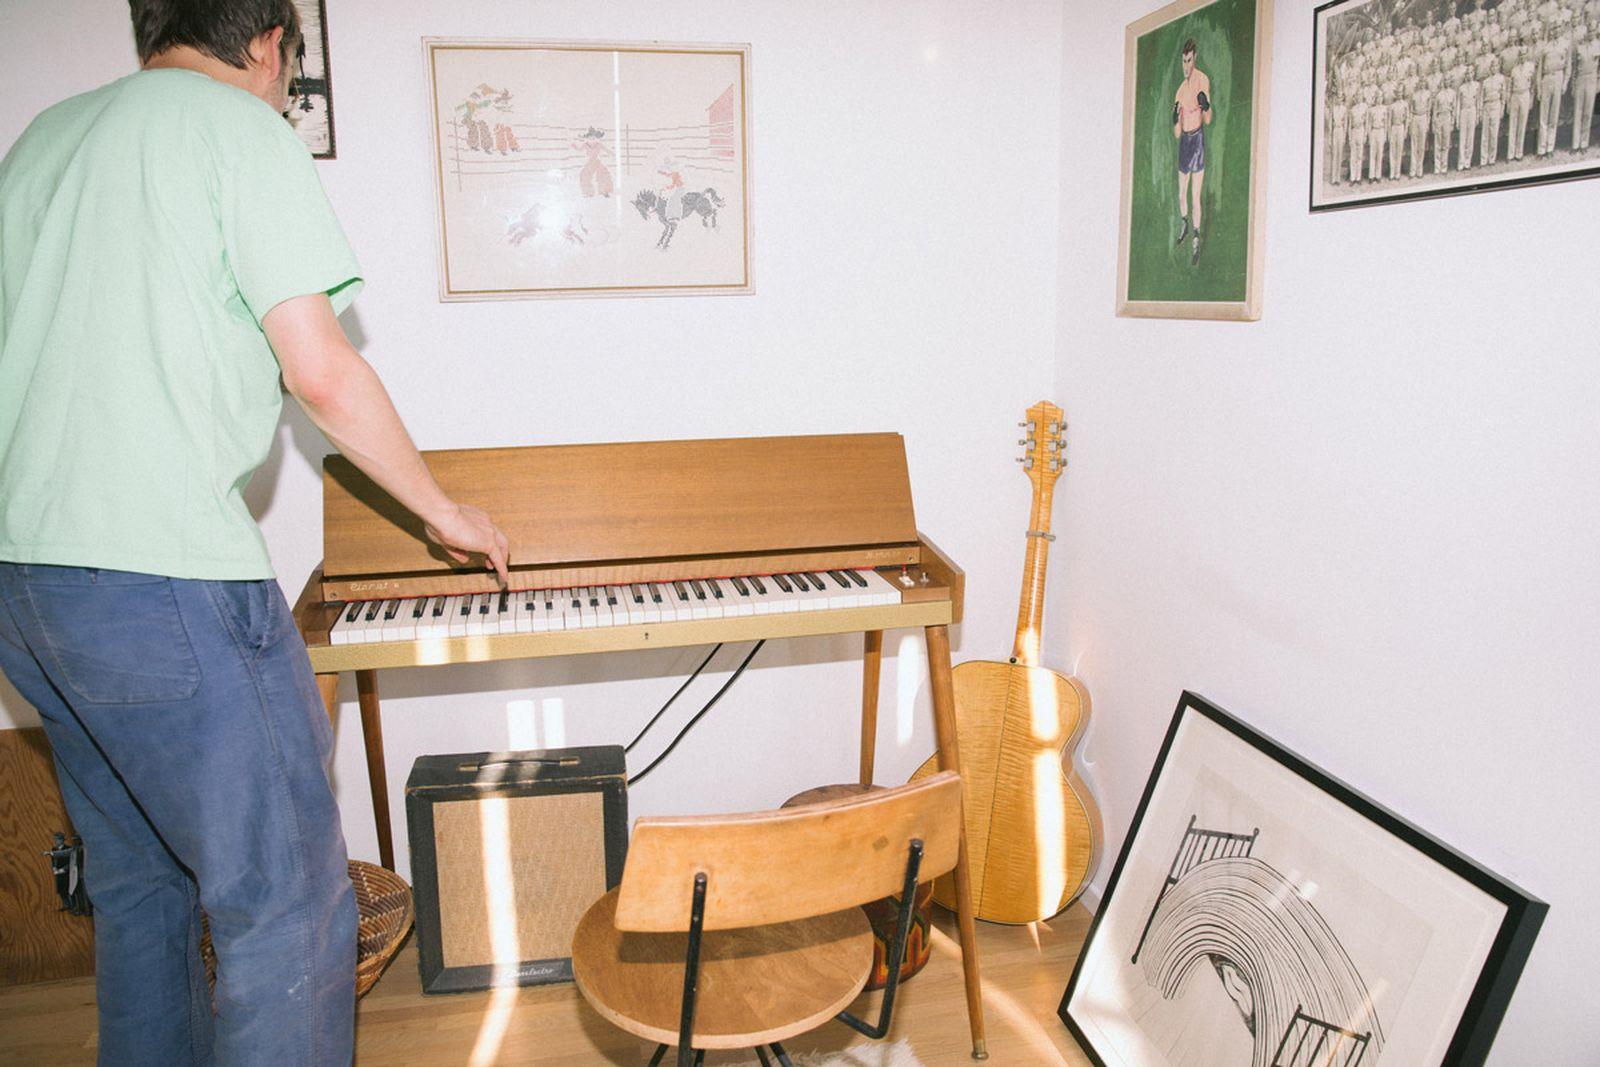 scott sternerg interview band of outsiders entireworld scott sternberg